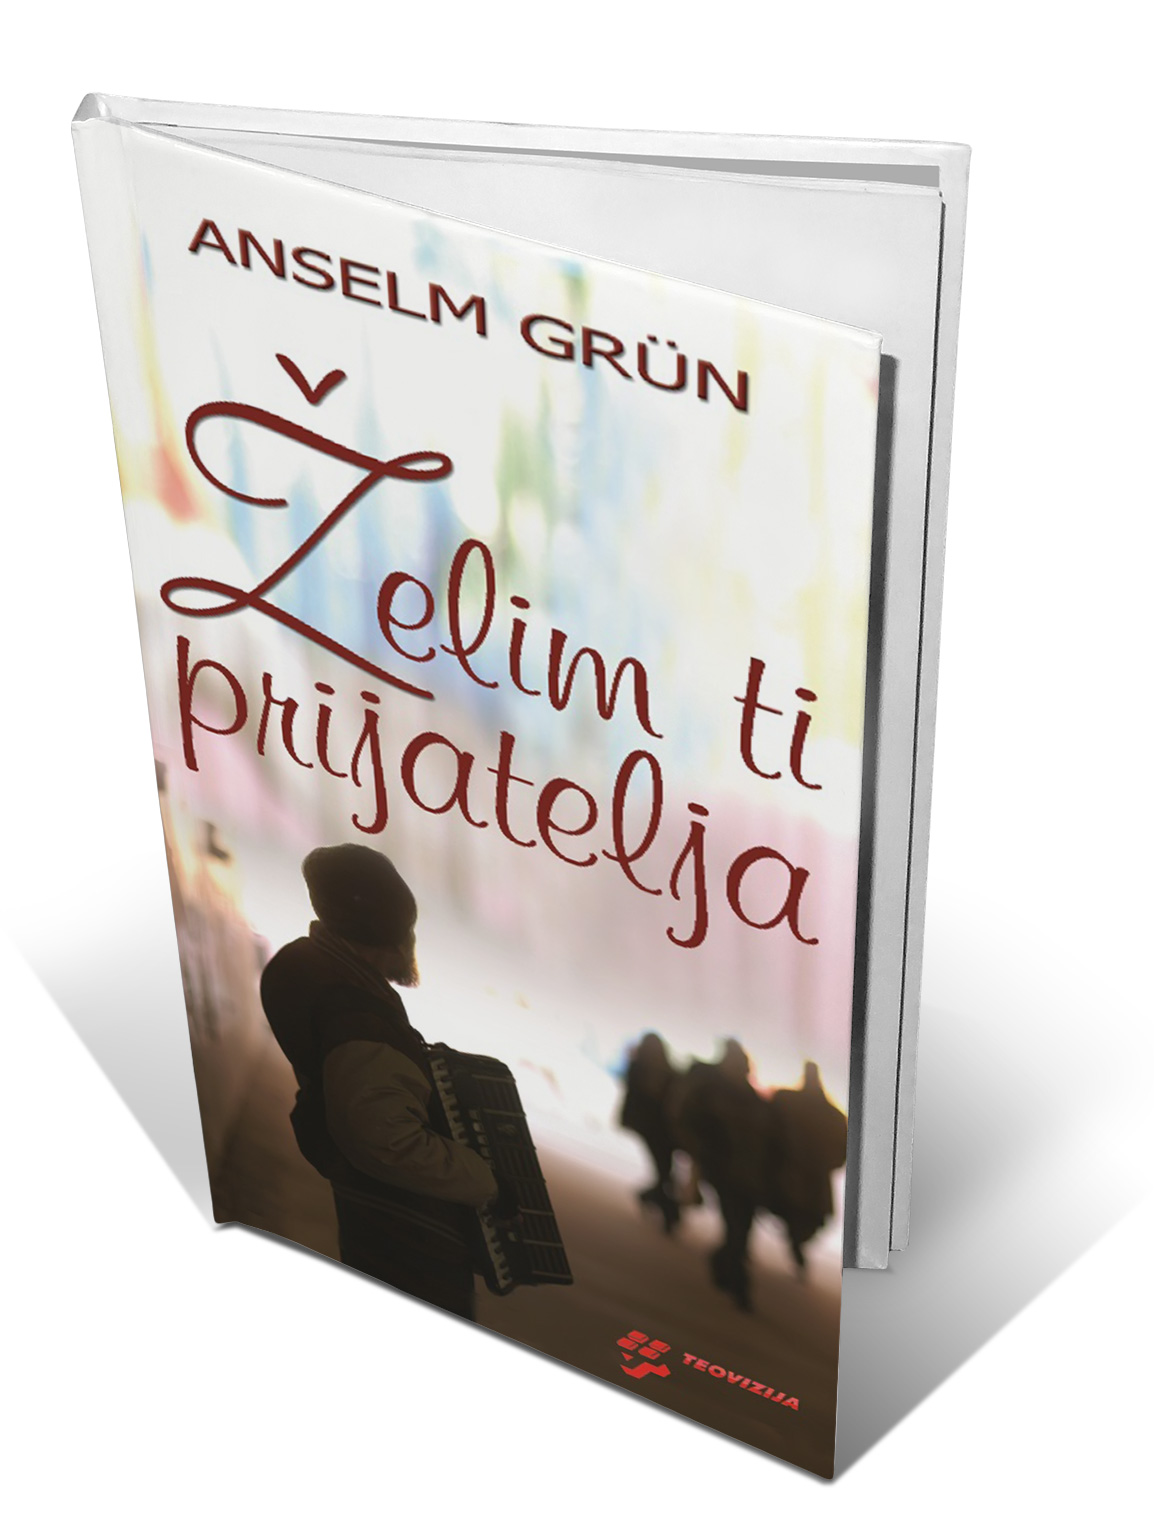 ŽELIM TI PRIJATELJA (meki uvez) - Anselm Grün